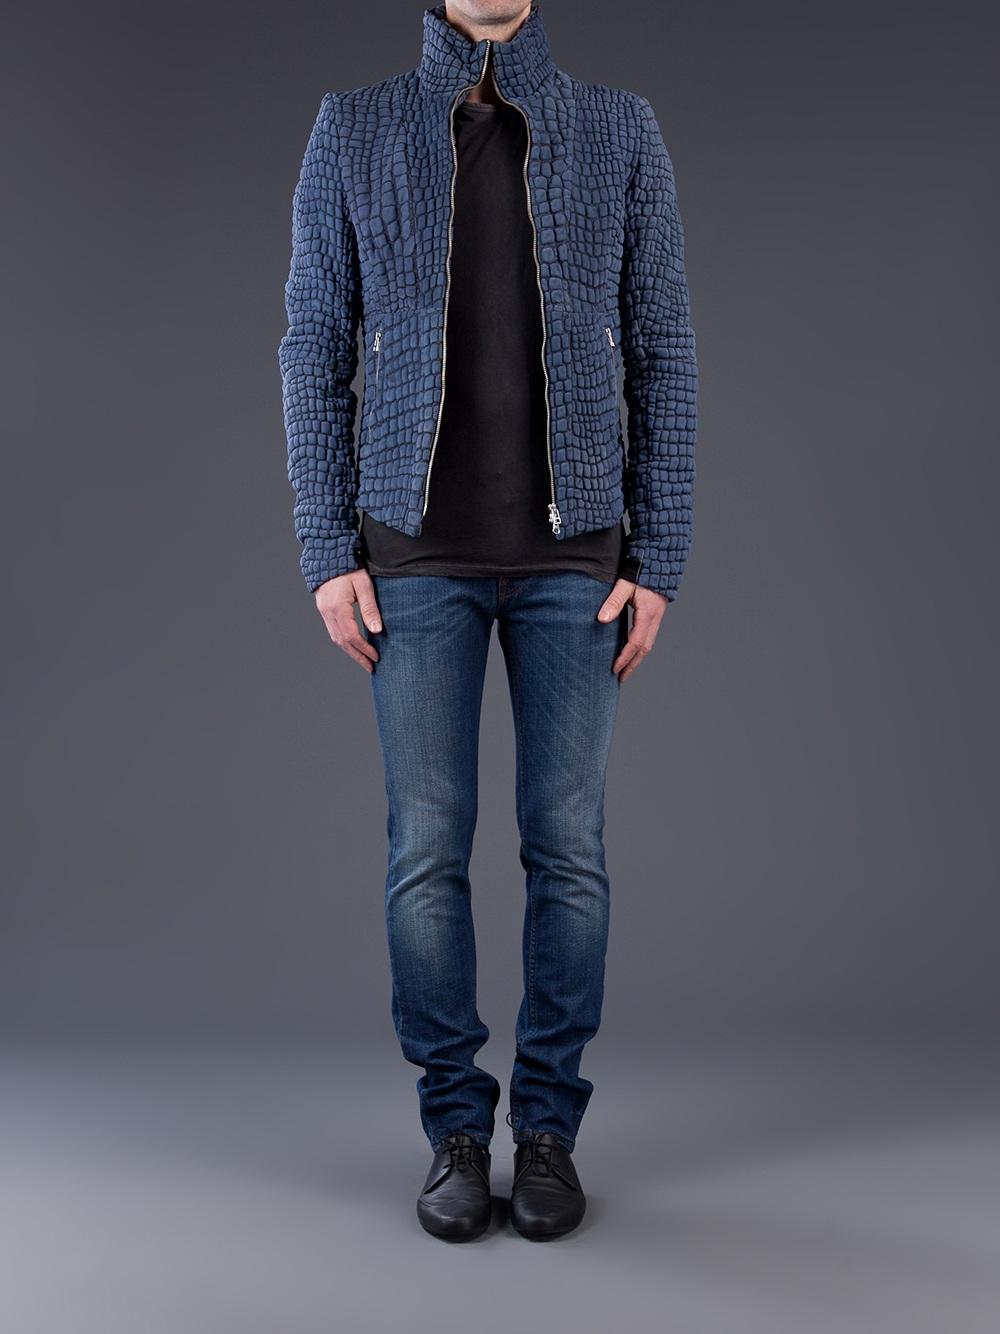 Lyst Unconditional Snake Skin Jacket In Blue For Men